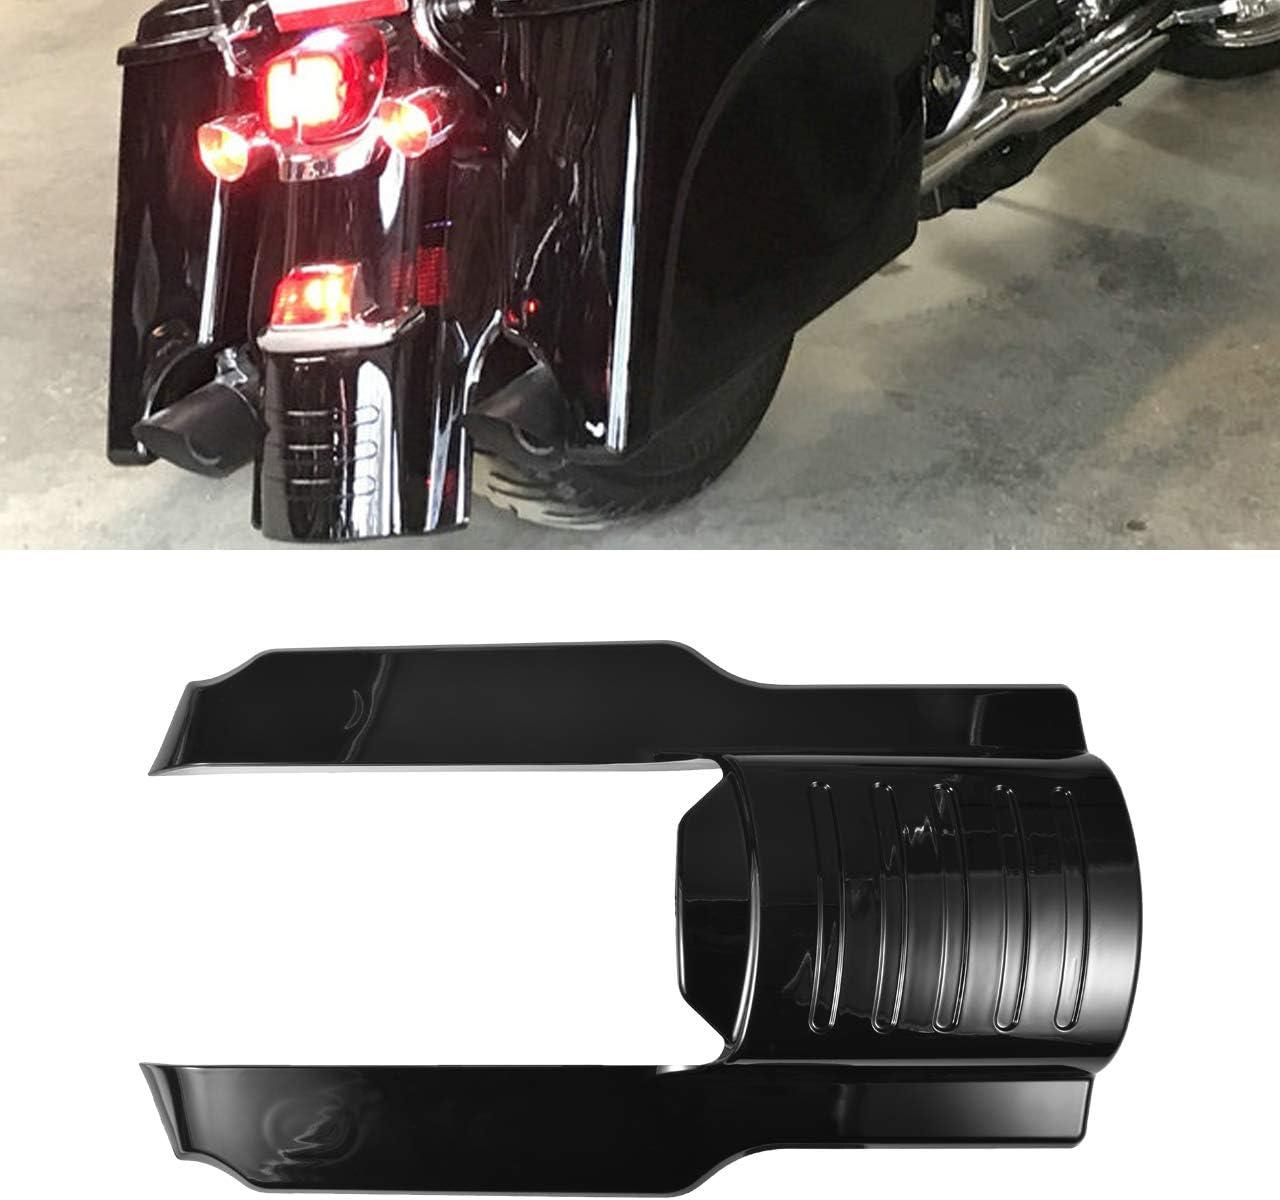 XMMT Motorcycle Vivid//Gloss Black 5 Rear Fender Extension Stretched Filler for Harley Touring Street Gilde Road Gilde 2009-2013